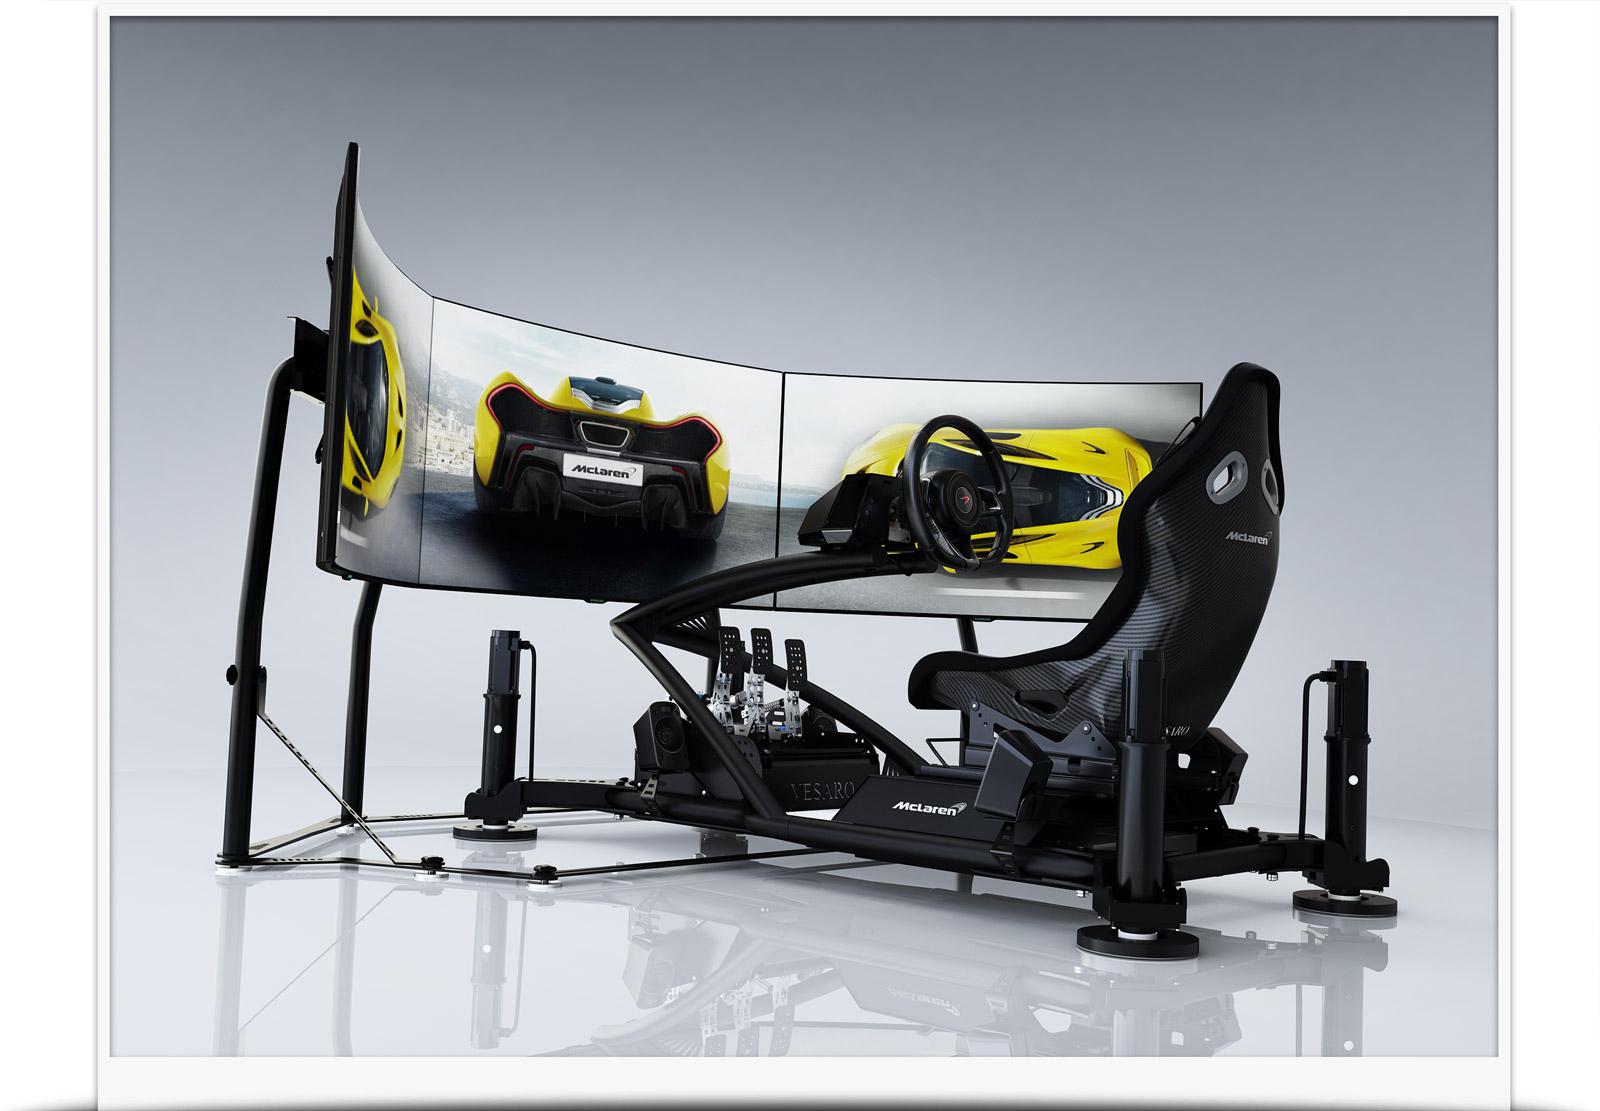 mclaren driving simulators. Black Bedroom Furniture Sets. Home Design Ideas